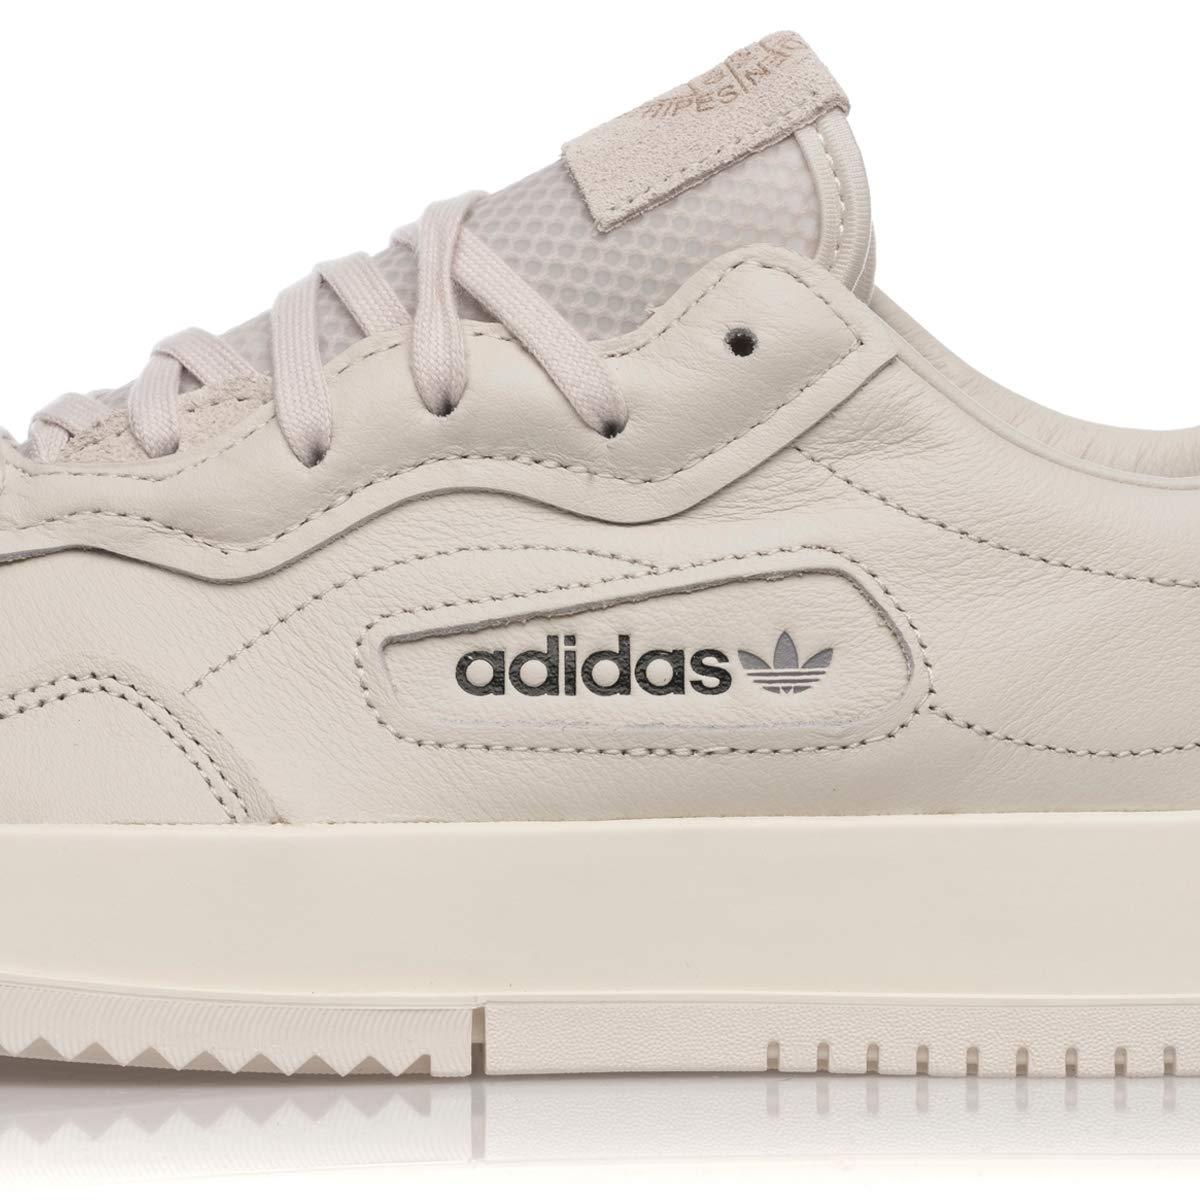 adidas Originals Super Court Premiere, raw White Chalk White